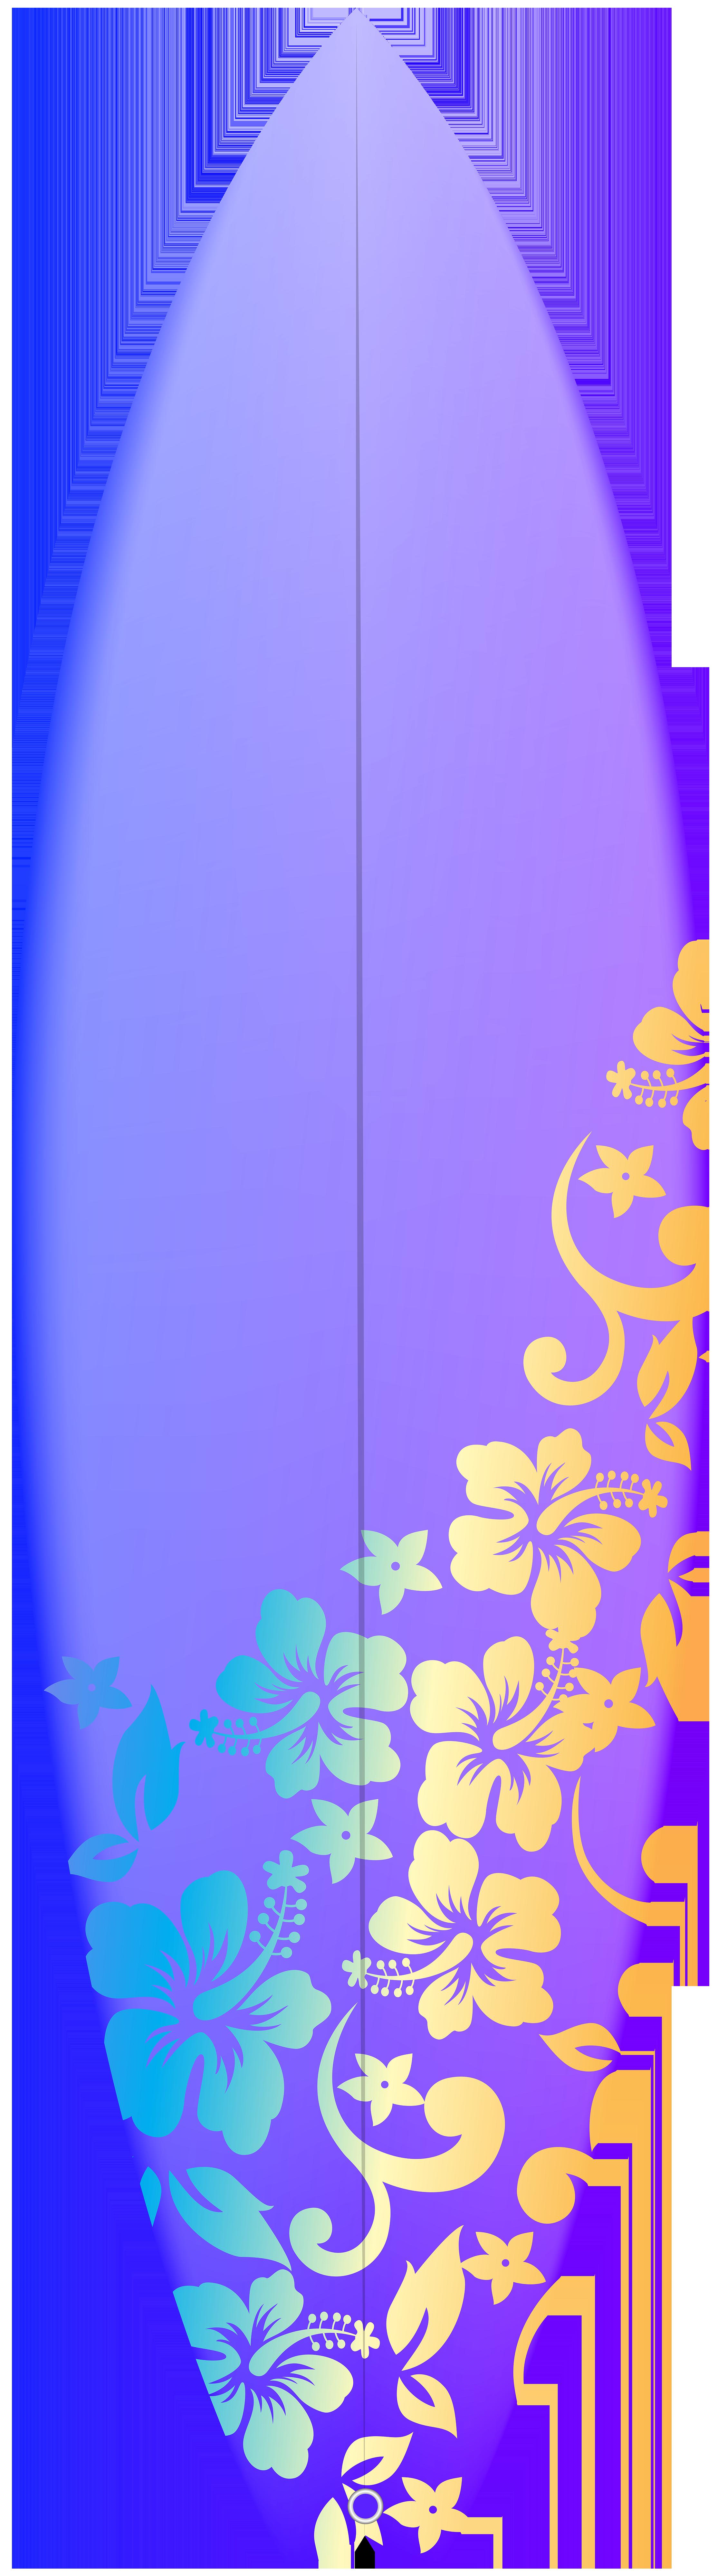 2257x8000 Surfboard Transparent Png Clip Art Imageu200b Gallery Yopriceville